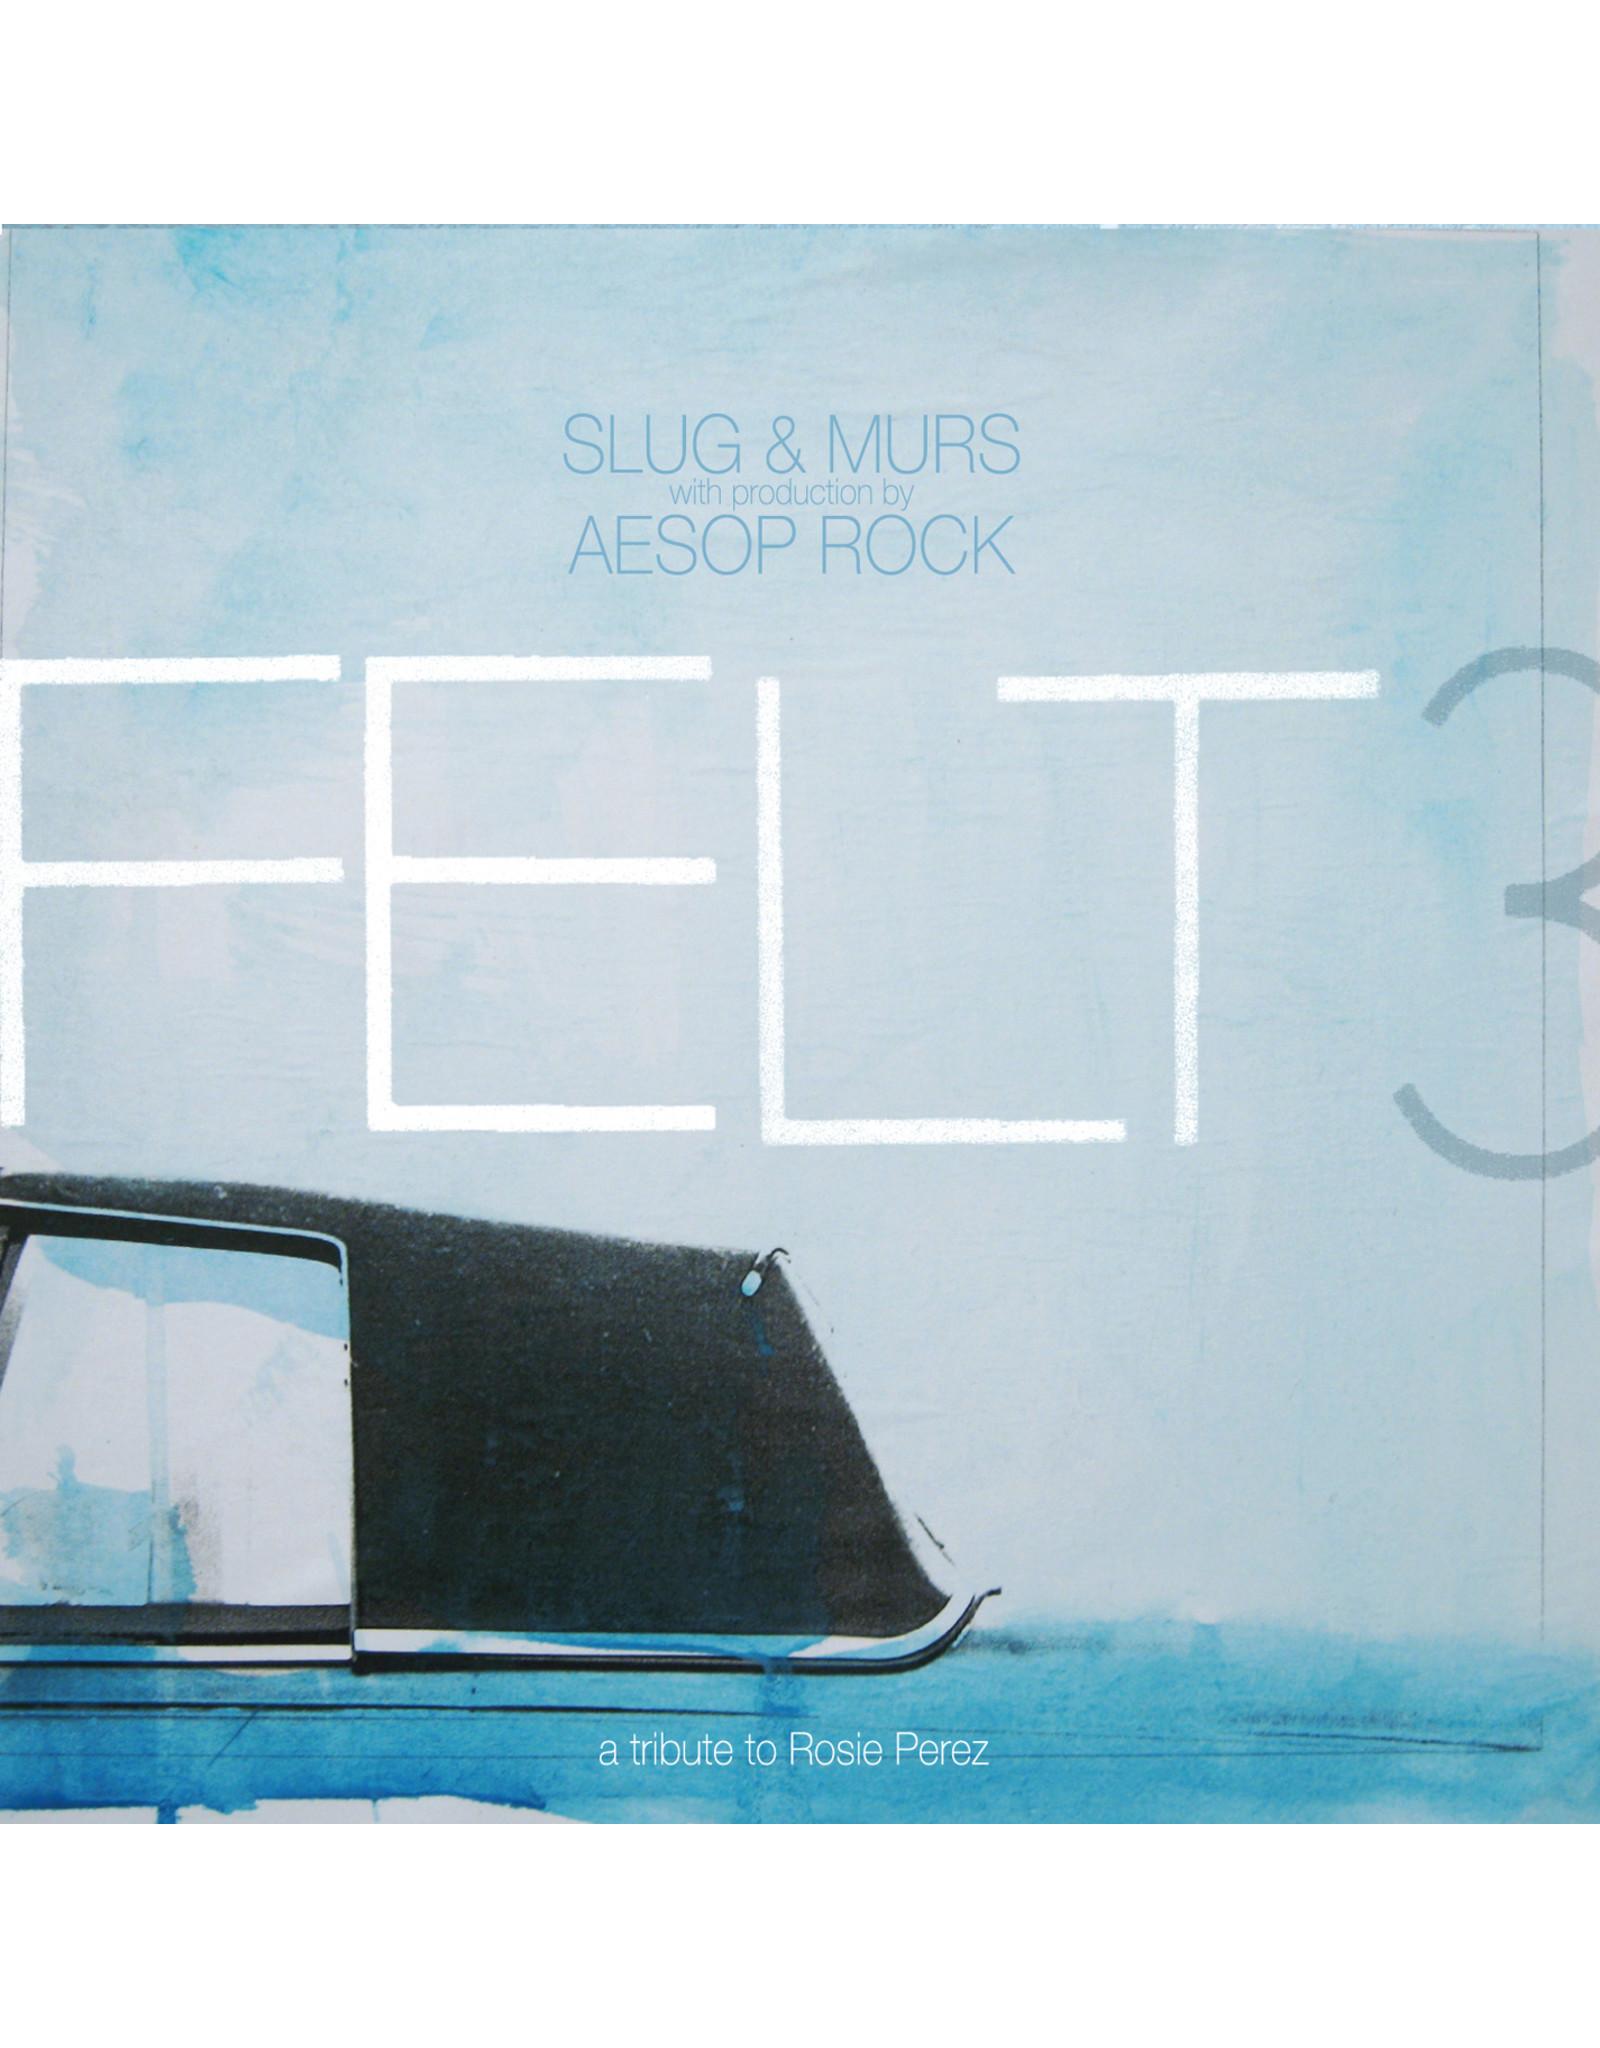 New Vinyl Slug & Murs w/ Aesop Rock - Felt 3: A Tribute To Rosie Perez (10th Anniversary, Colored) 2LP